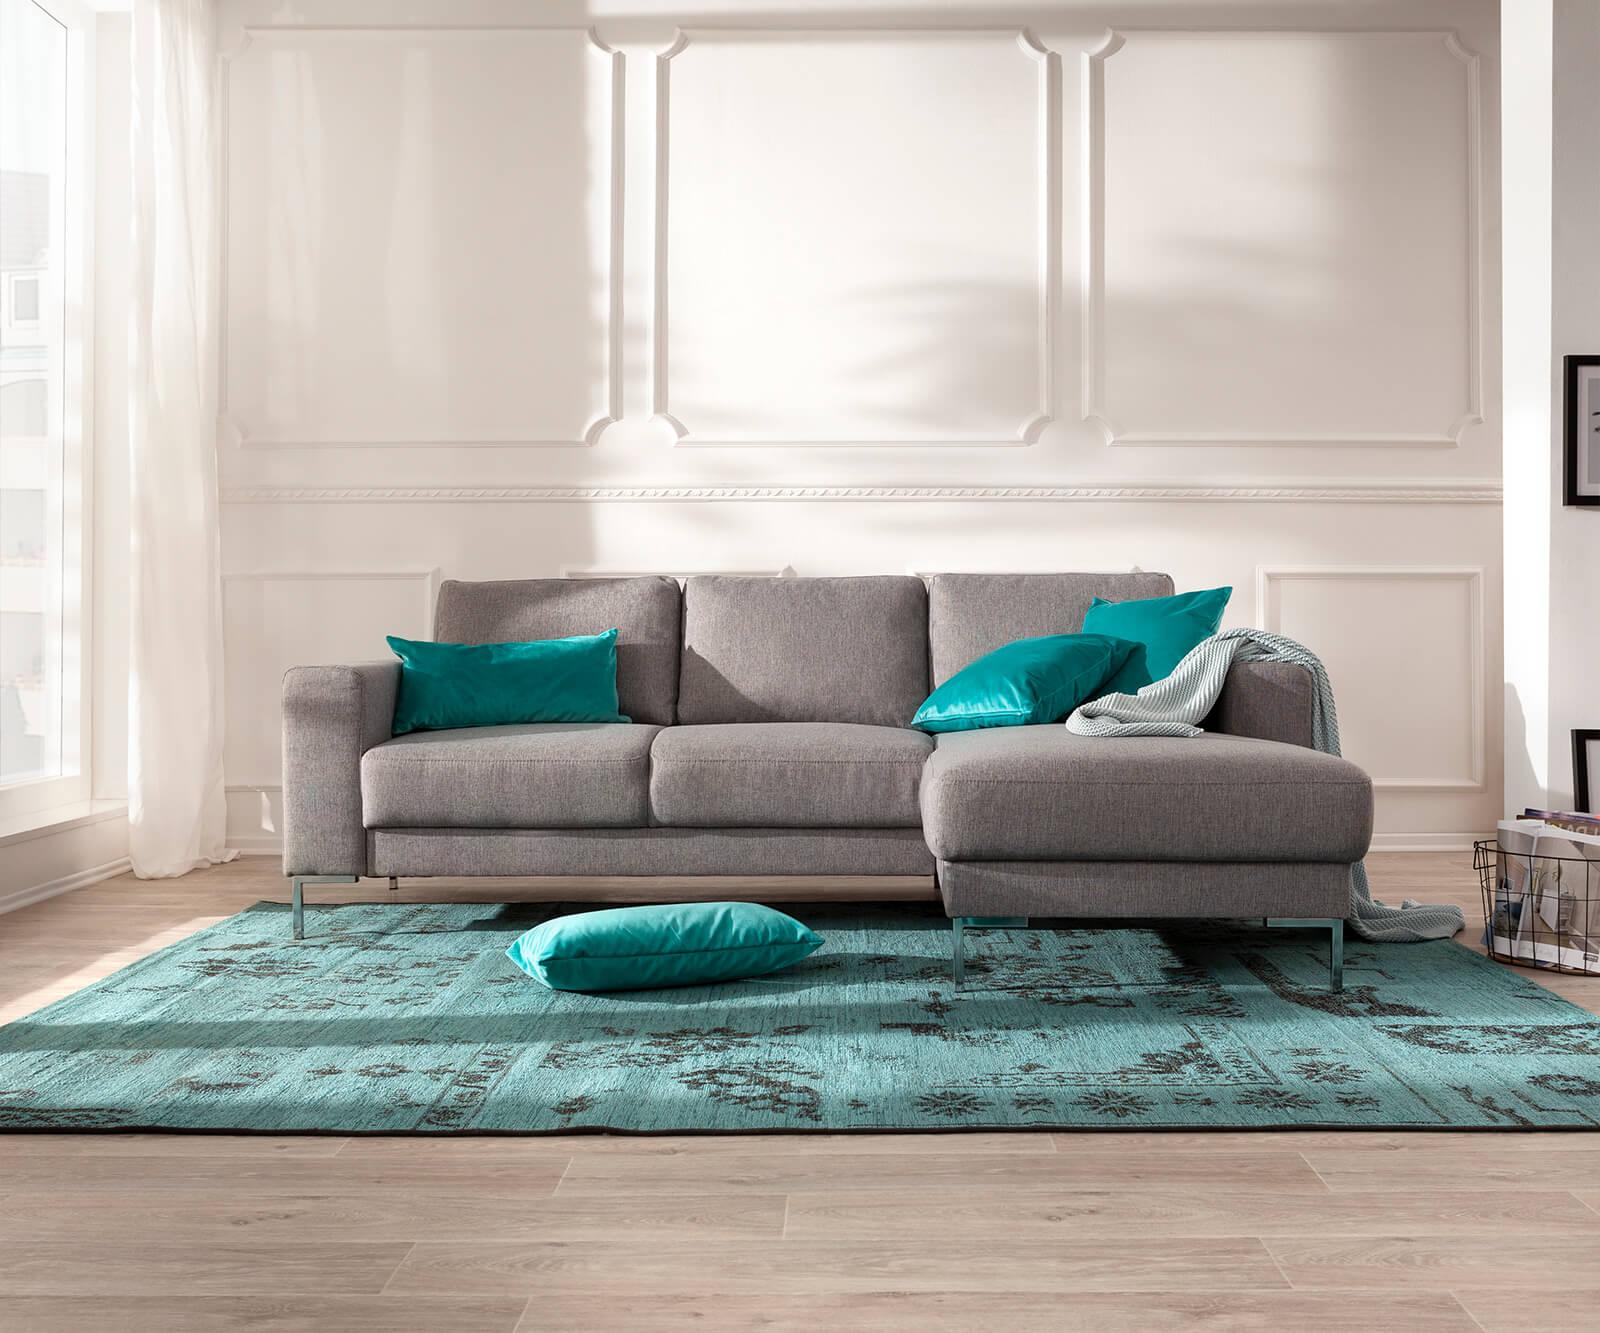 delife-designer-ecksofa-silas-235x147-cm-grau-ottomane-rechts-ecksofas-designer-sofa